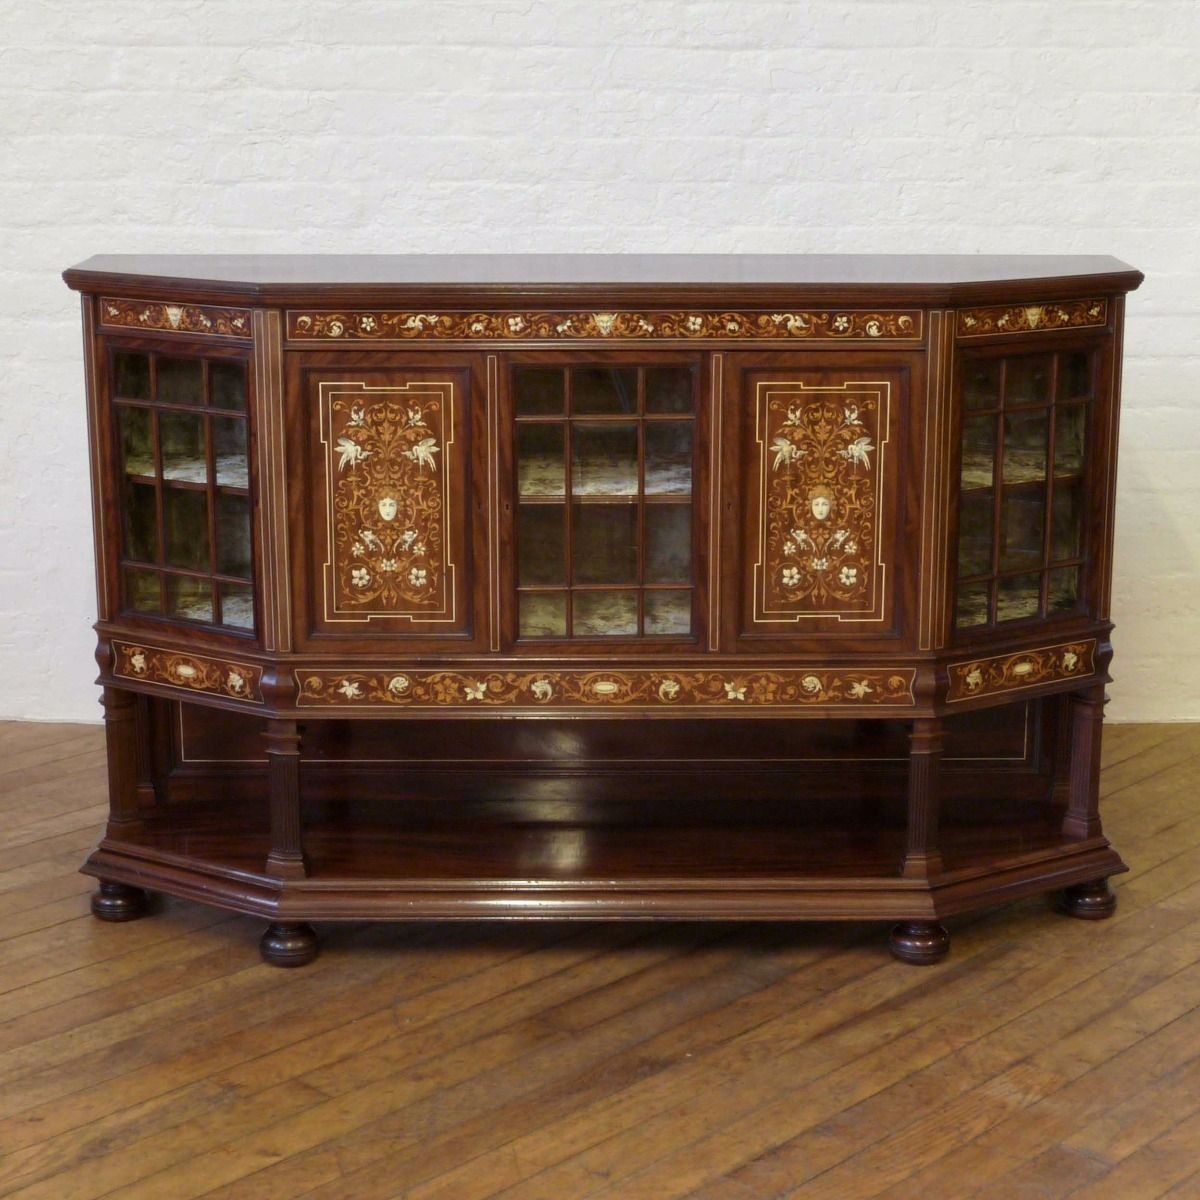 Antique Furniture Identification Marks